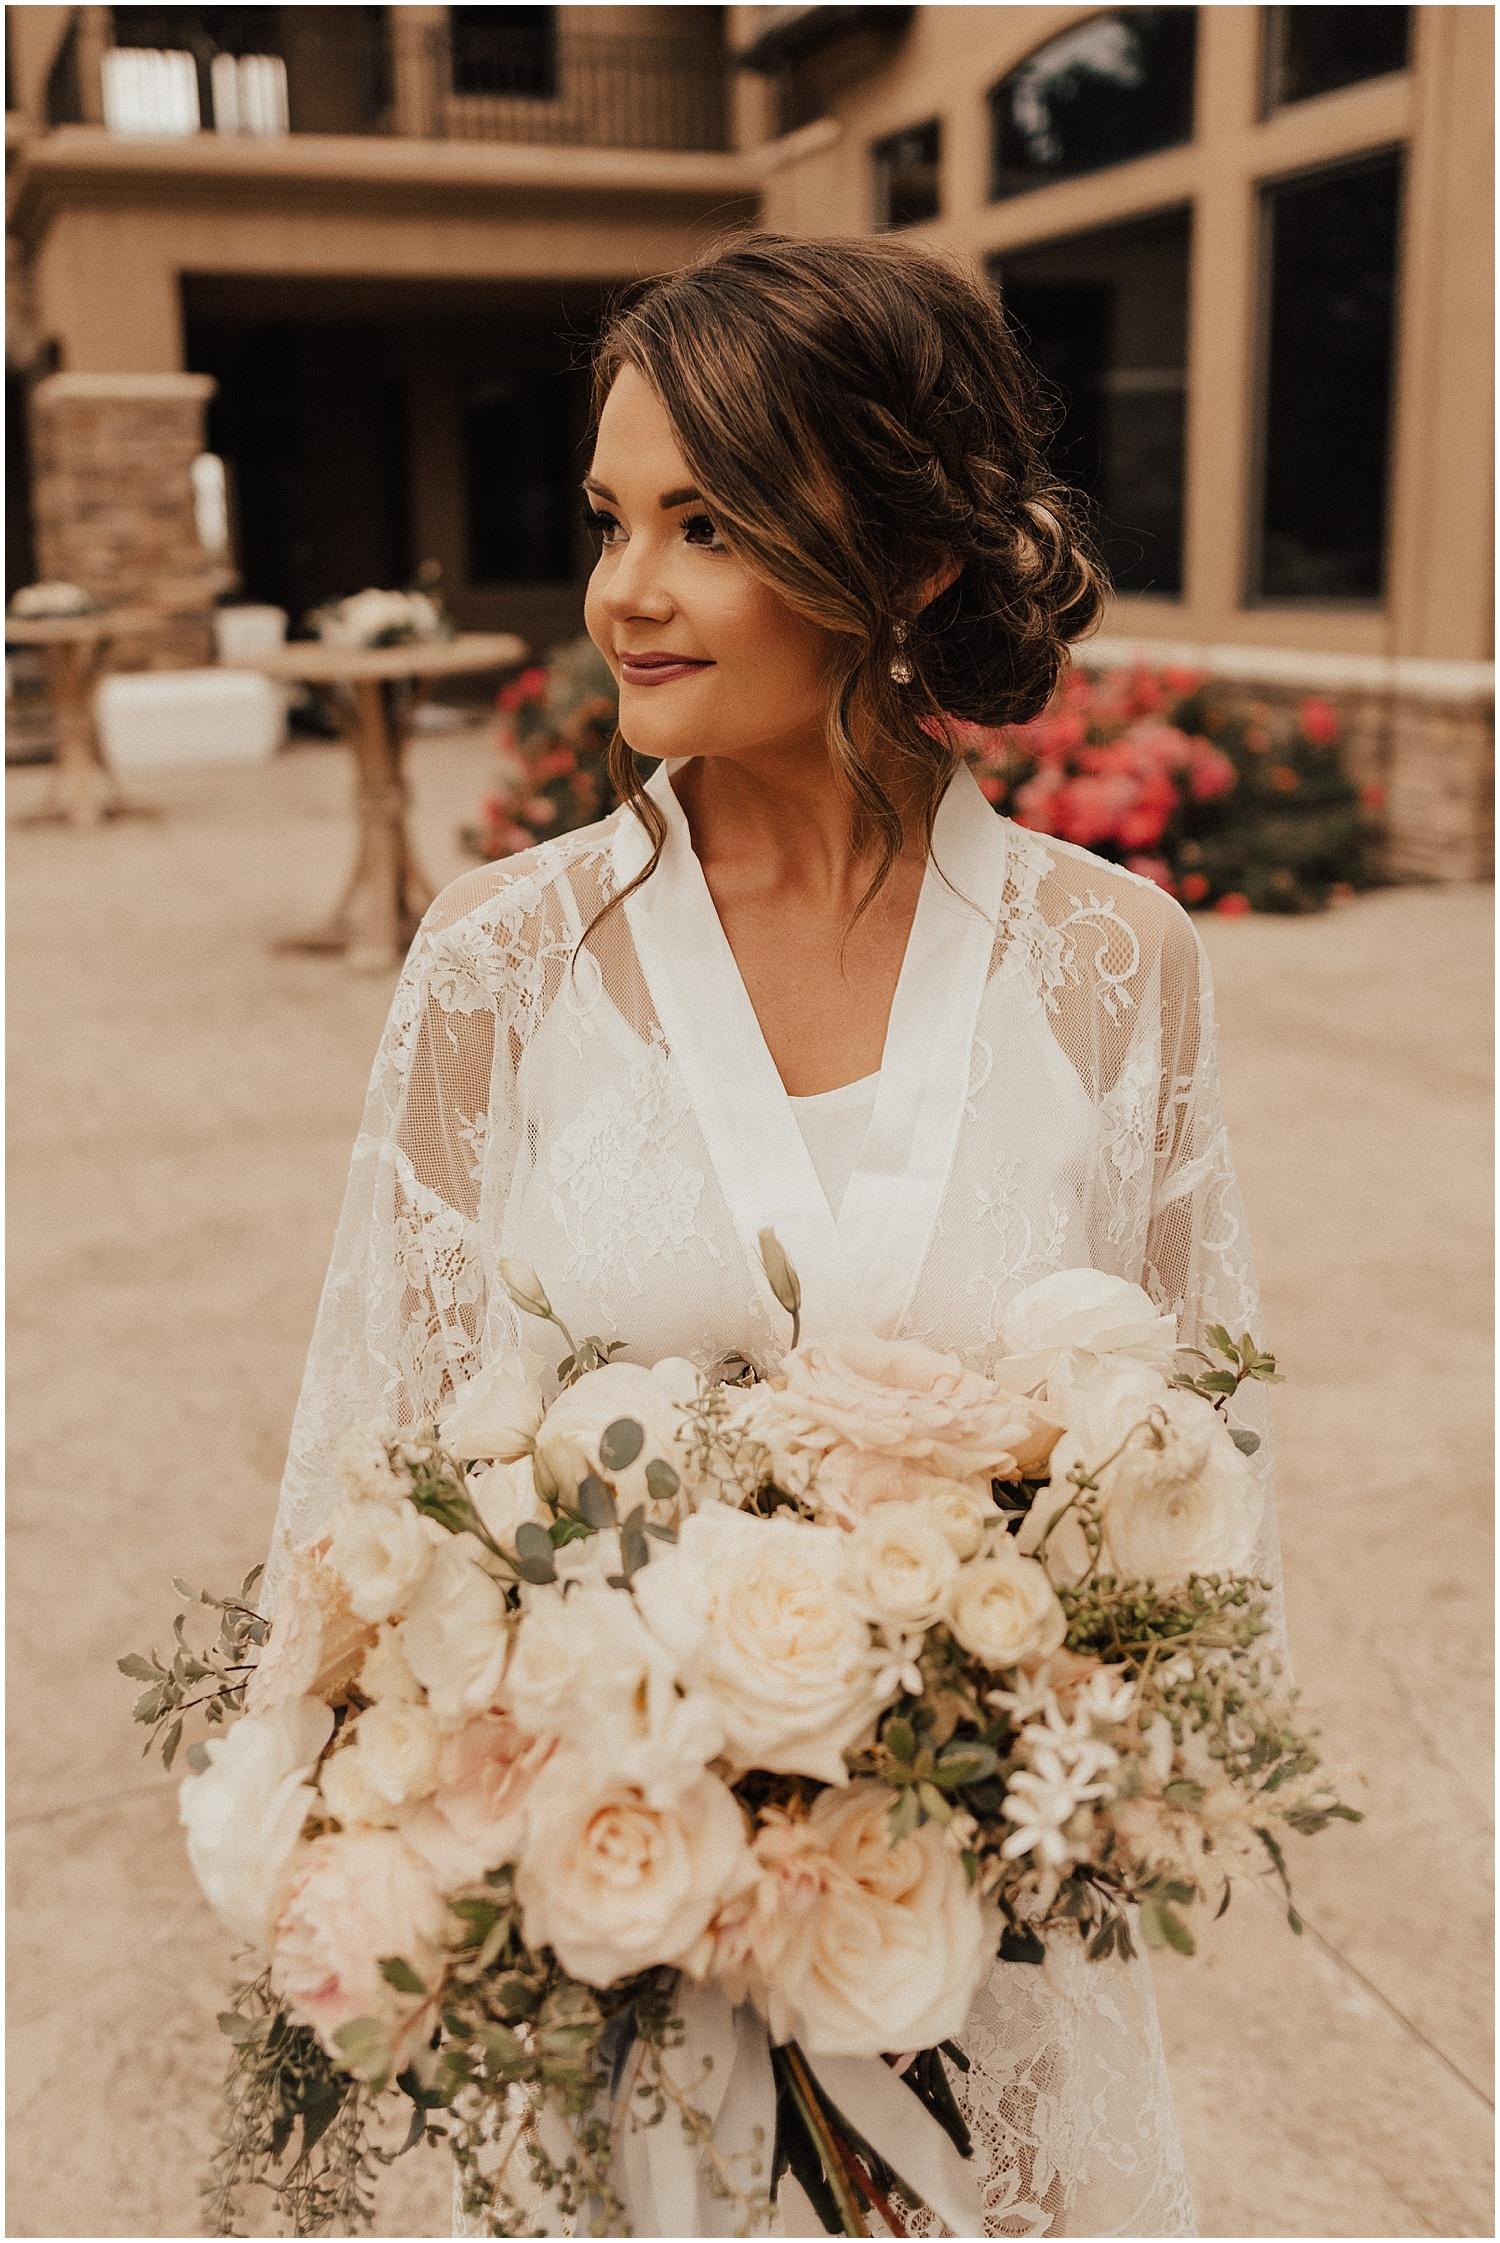 whimsical-summer-wedding-boise-idaho-las-vegas-bride59.jpg